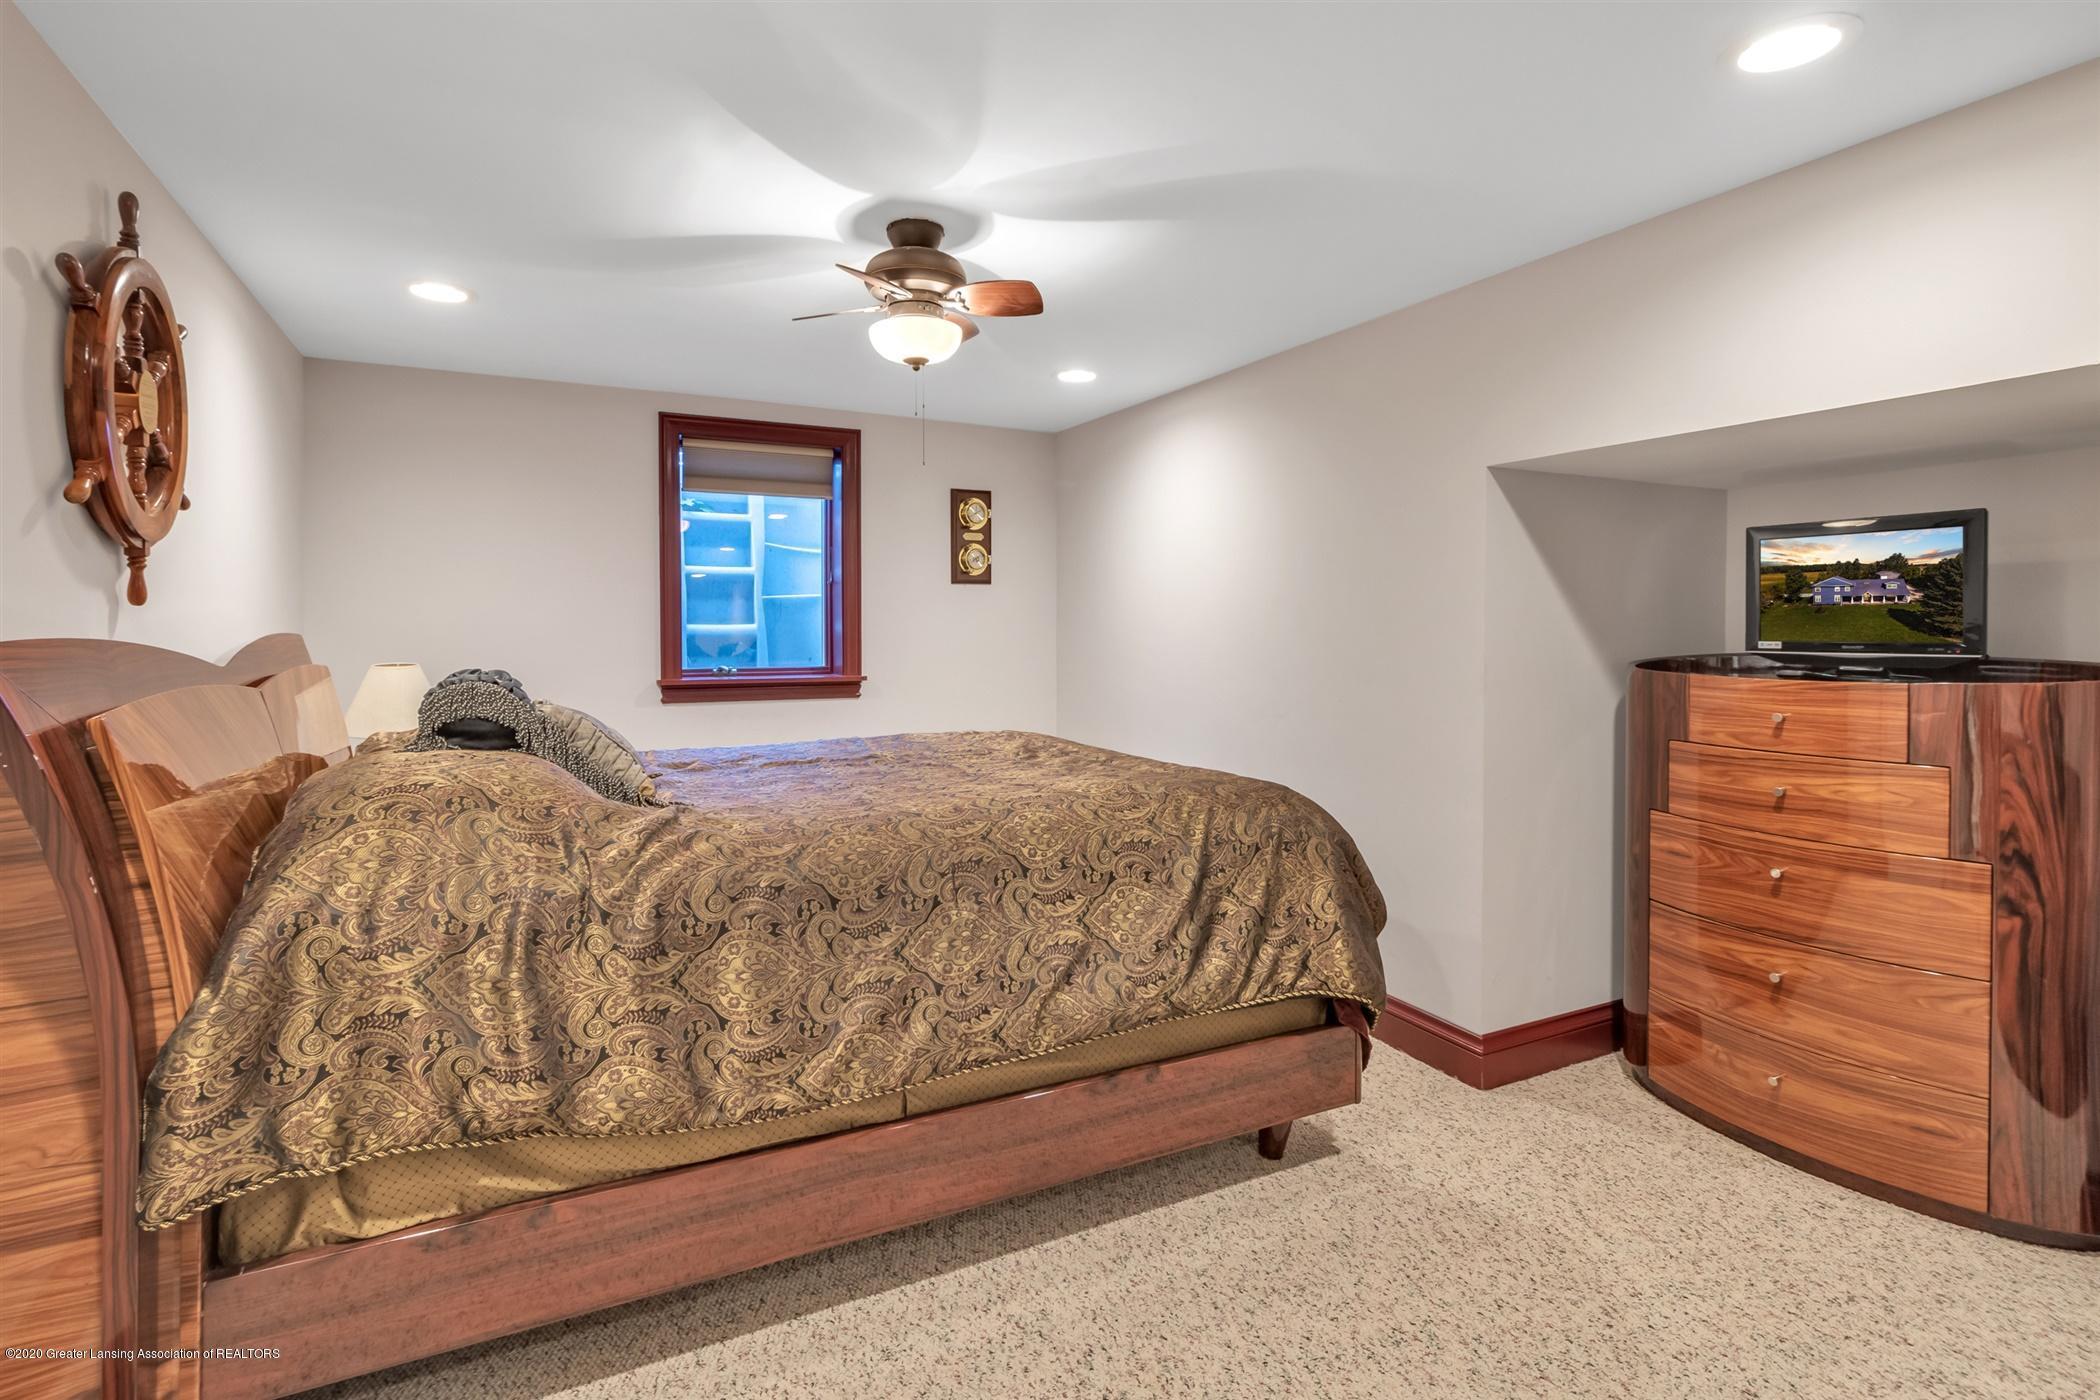 7346 W Cutler Rd - 4TH BEDROOM - 53